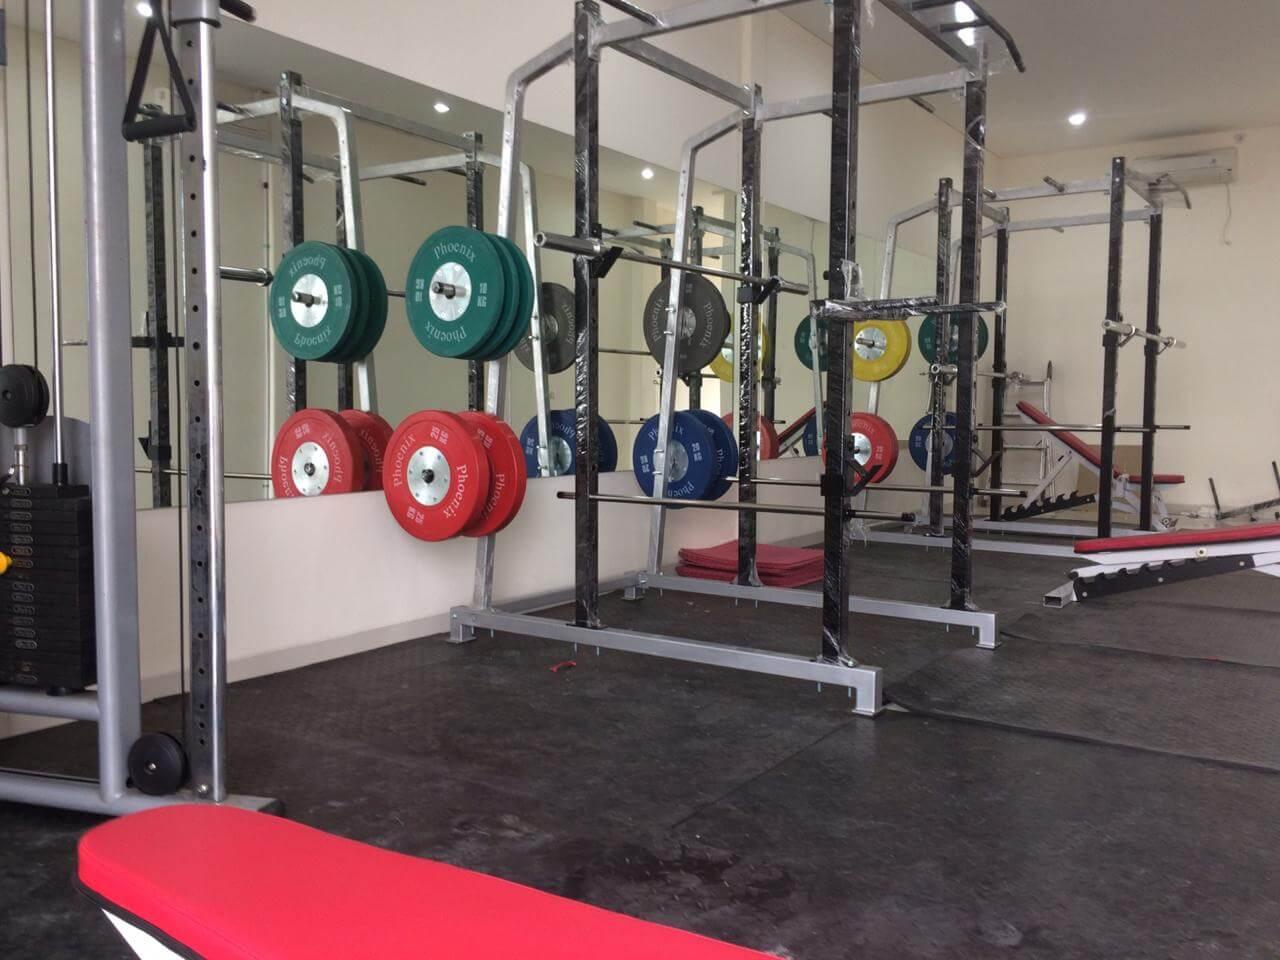 Gym & Personal trainer di bandung